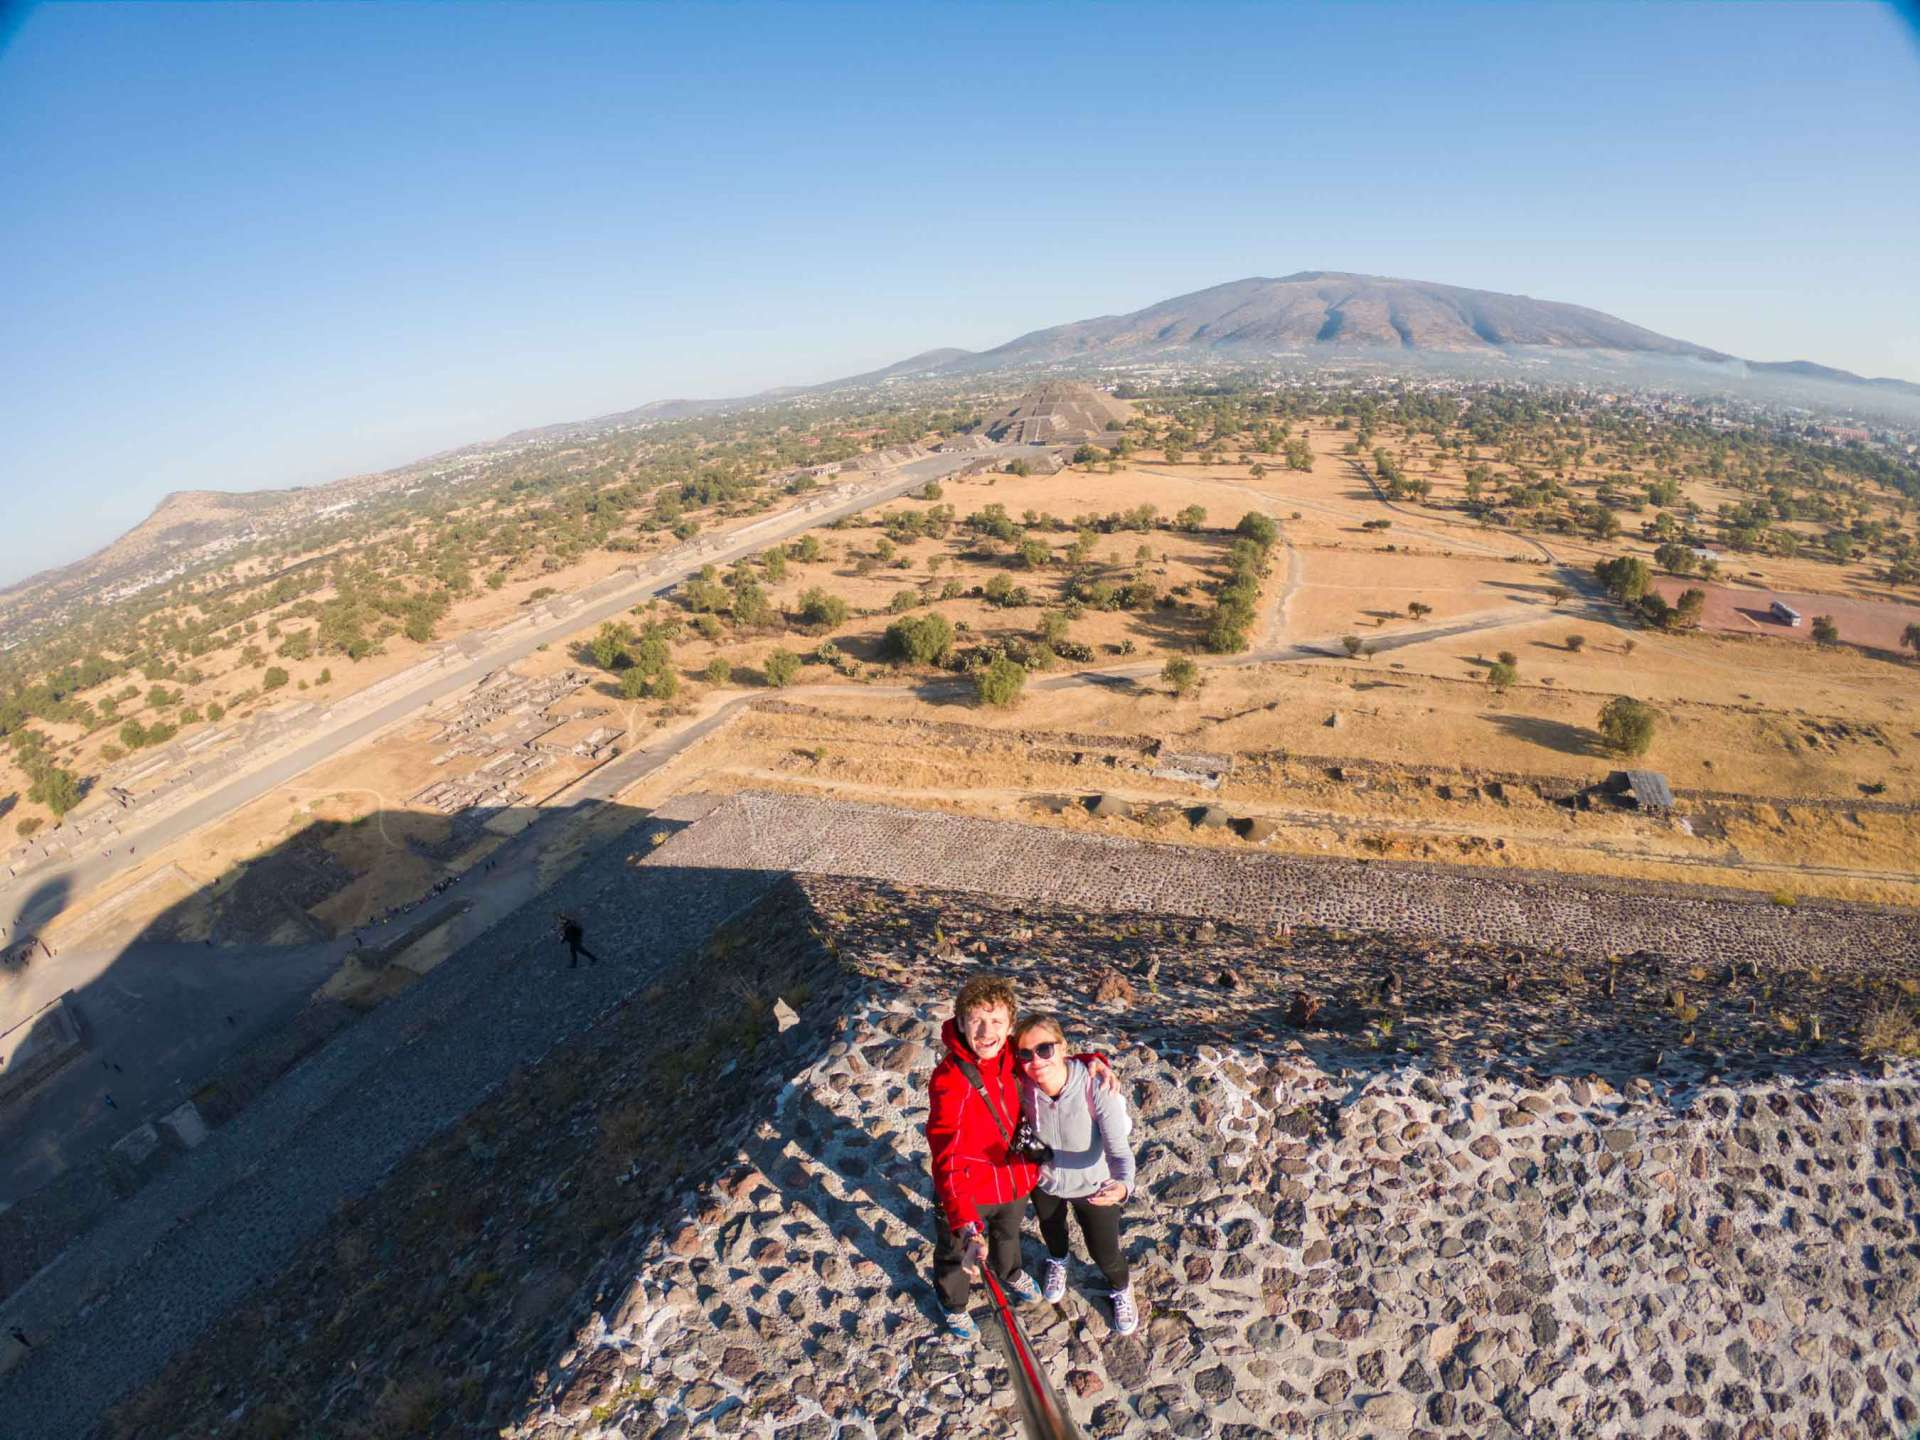 Teotihuacan Pyramids Mexico City Enrico Pescantini photographer 2